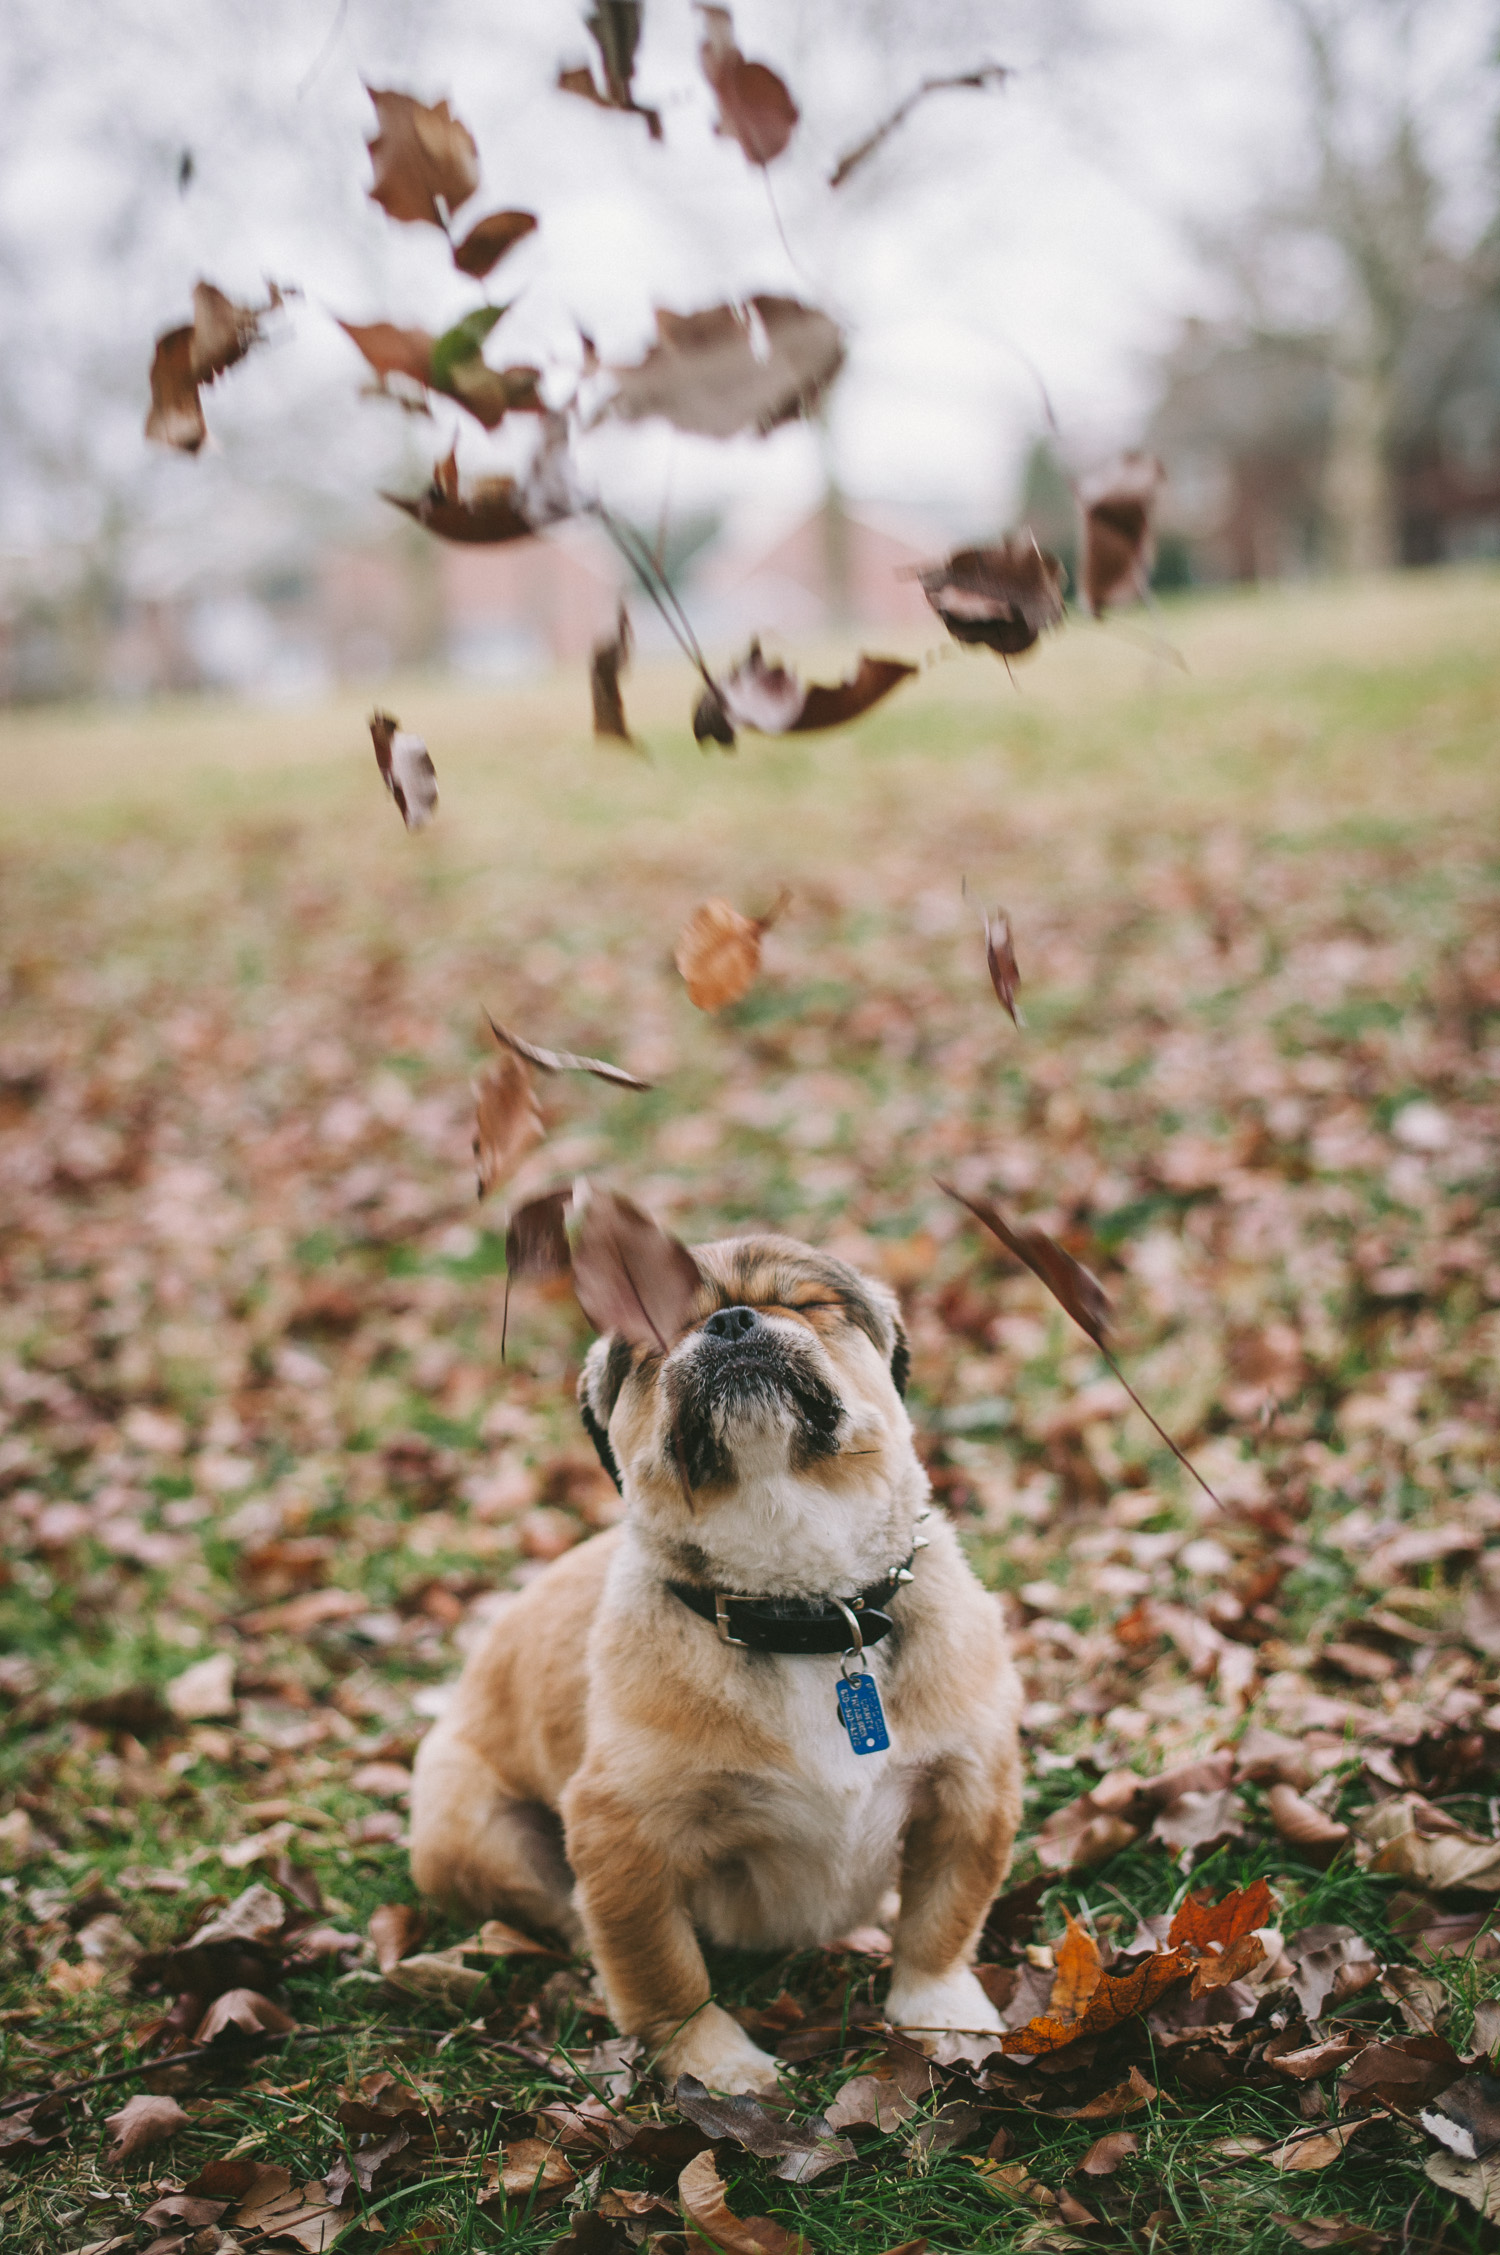 pat-robinson-photography-dog-5.jpg